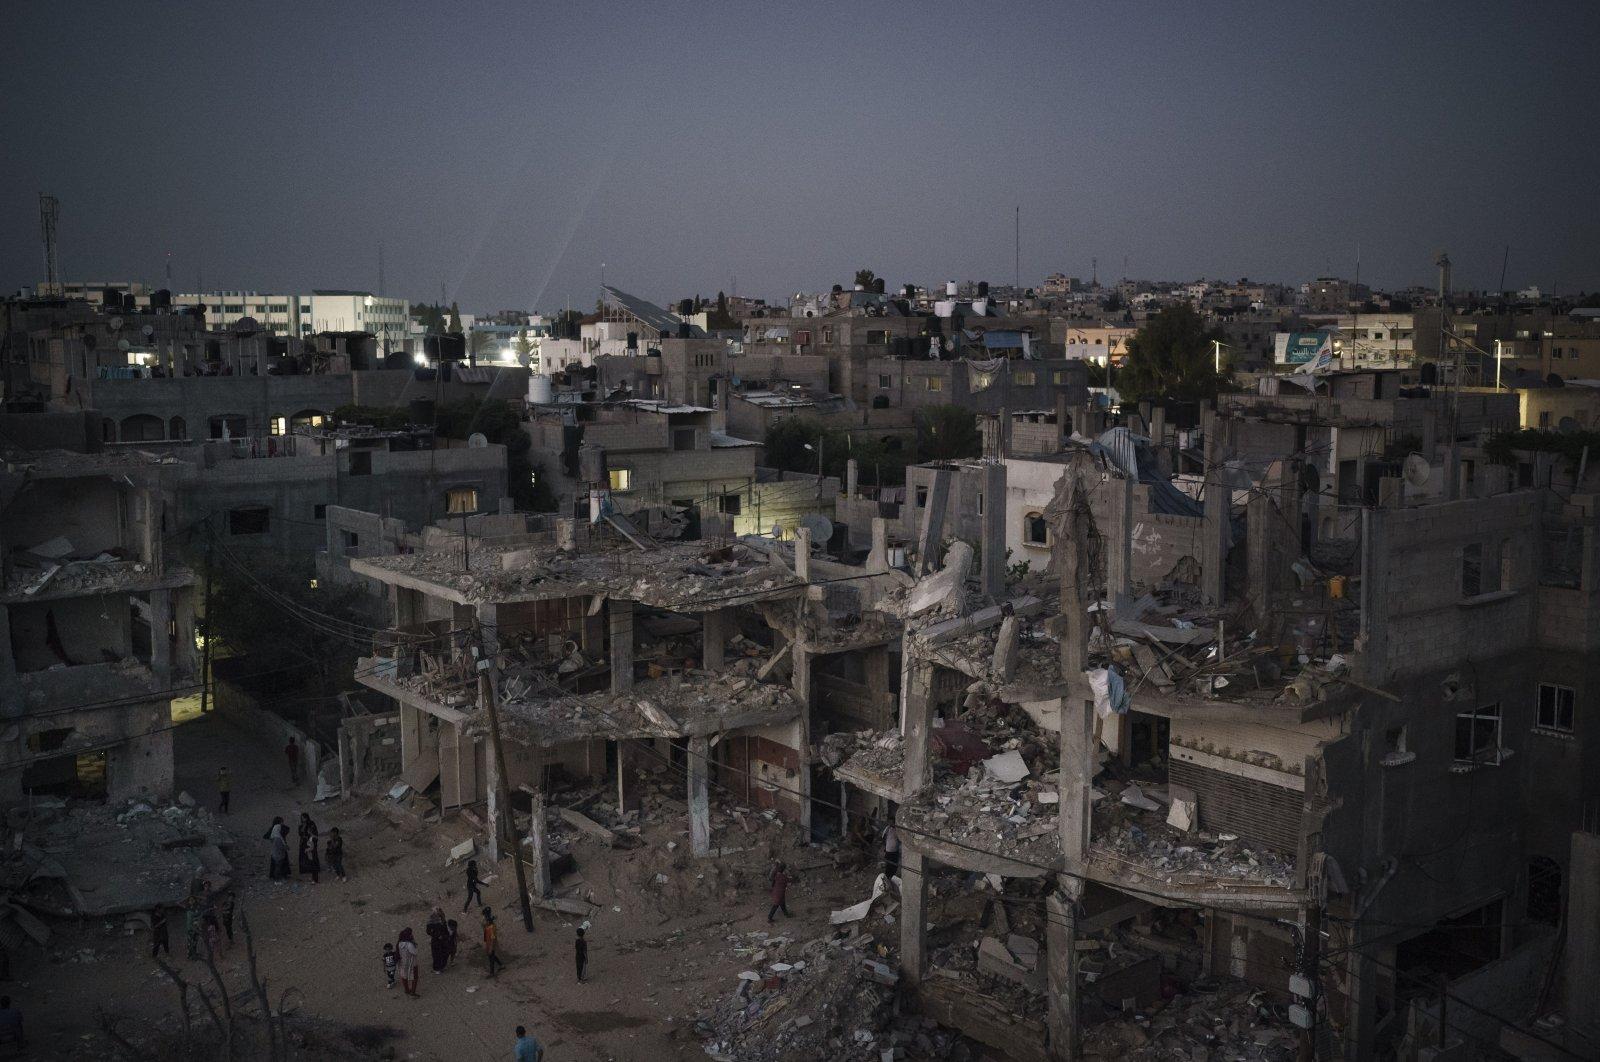 Palestinians walk at night along Al-Baali Street, next to homes heavily damaged by airstrikes during an 11-day war between Israel and Hamas in Beit Hanoun, northern Gaza Strip, Palestine, May 31, 2021. (AP Photo)